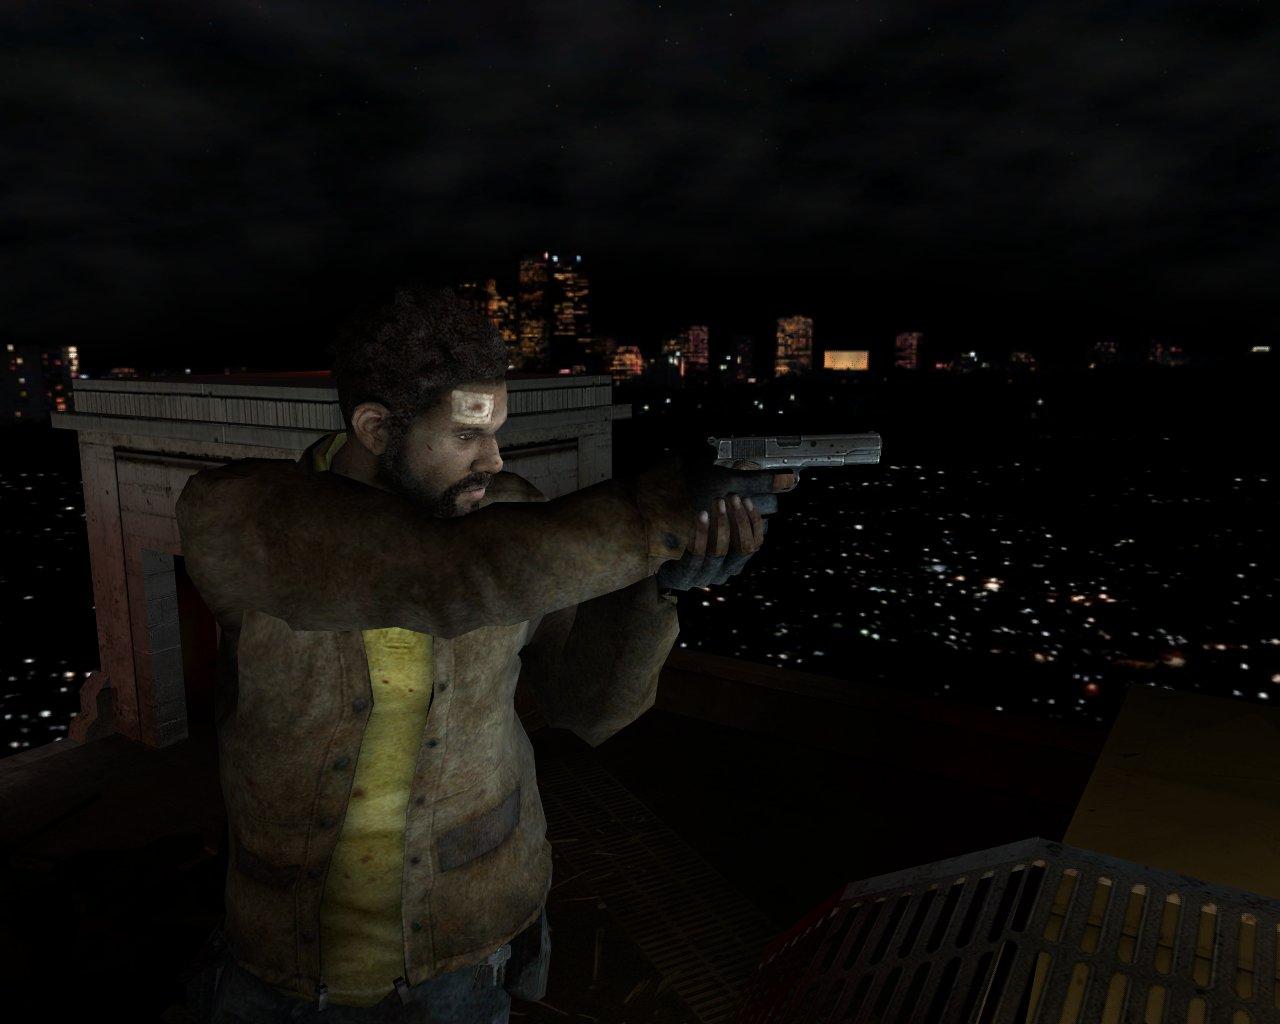 Louis-roof-pistol-1-.jpg